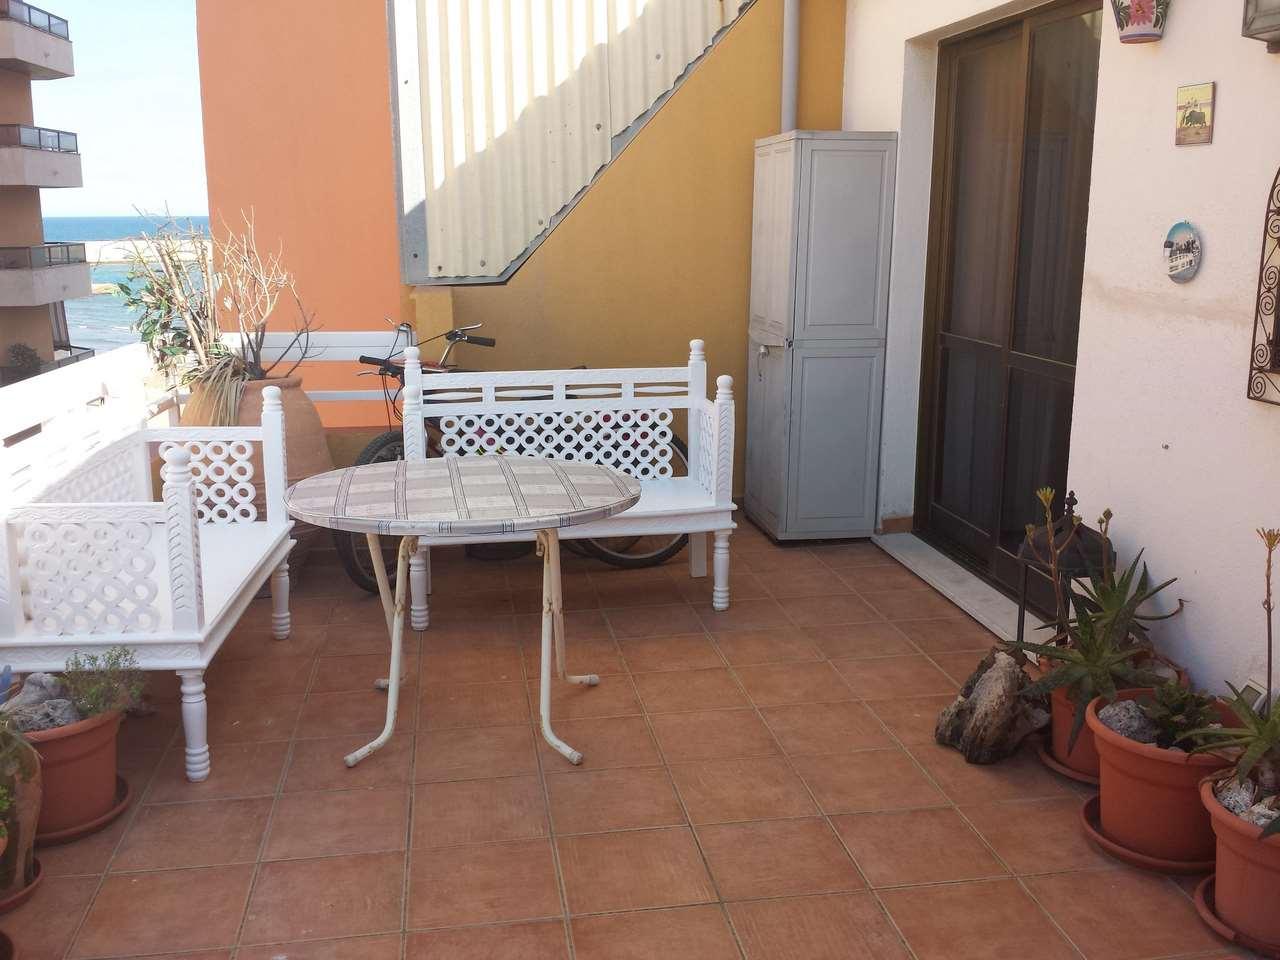 Habitaciones en alquiler Benicarló, Castellón